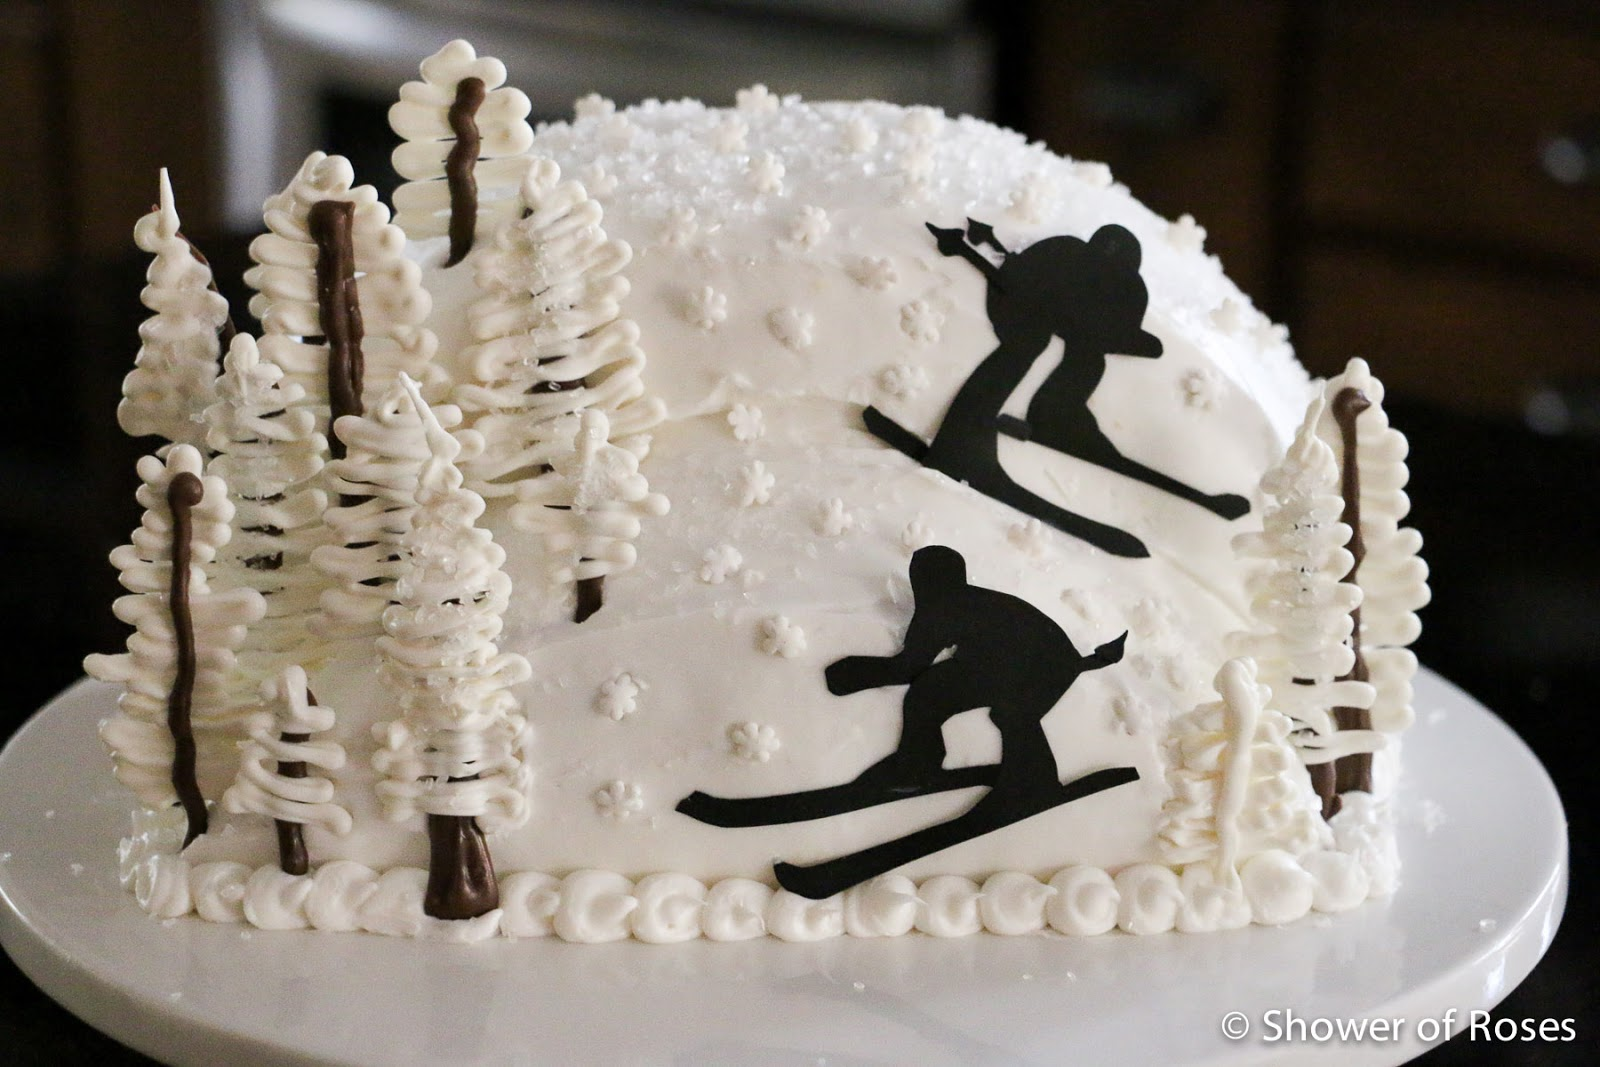 Shower Of Roses Snowy Mountain Ski Resort Birthday Cake